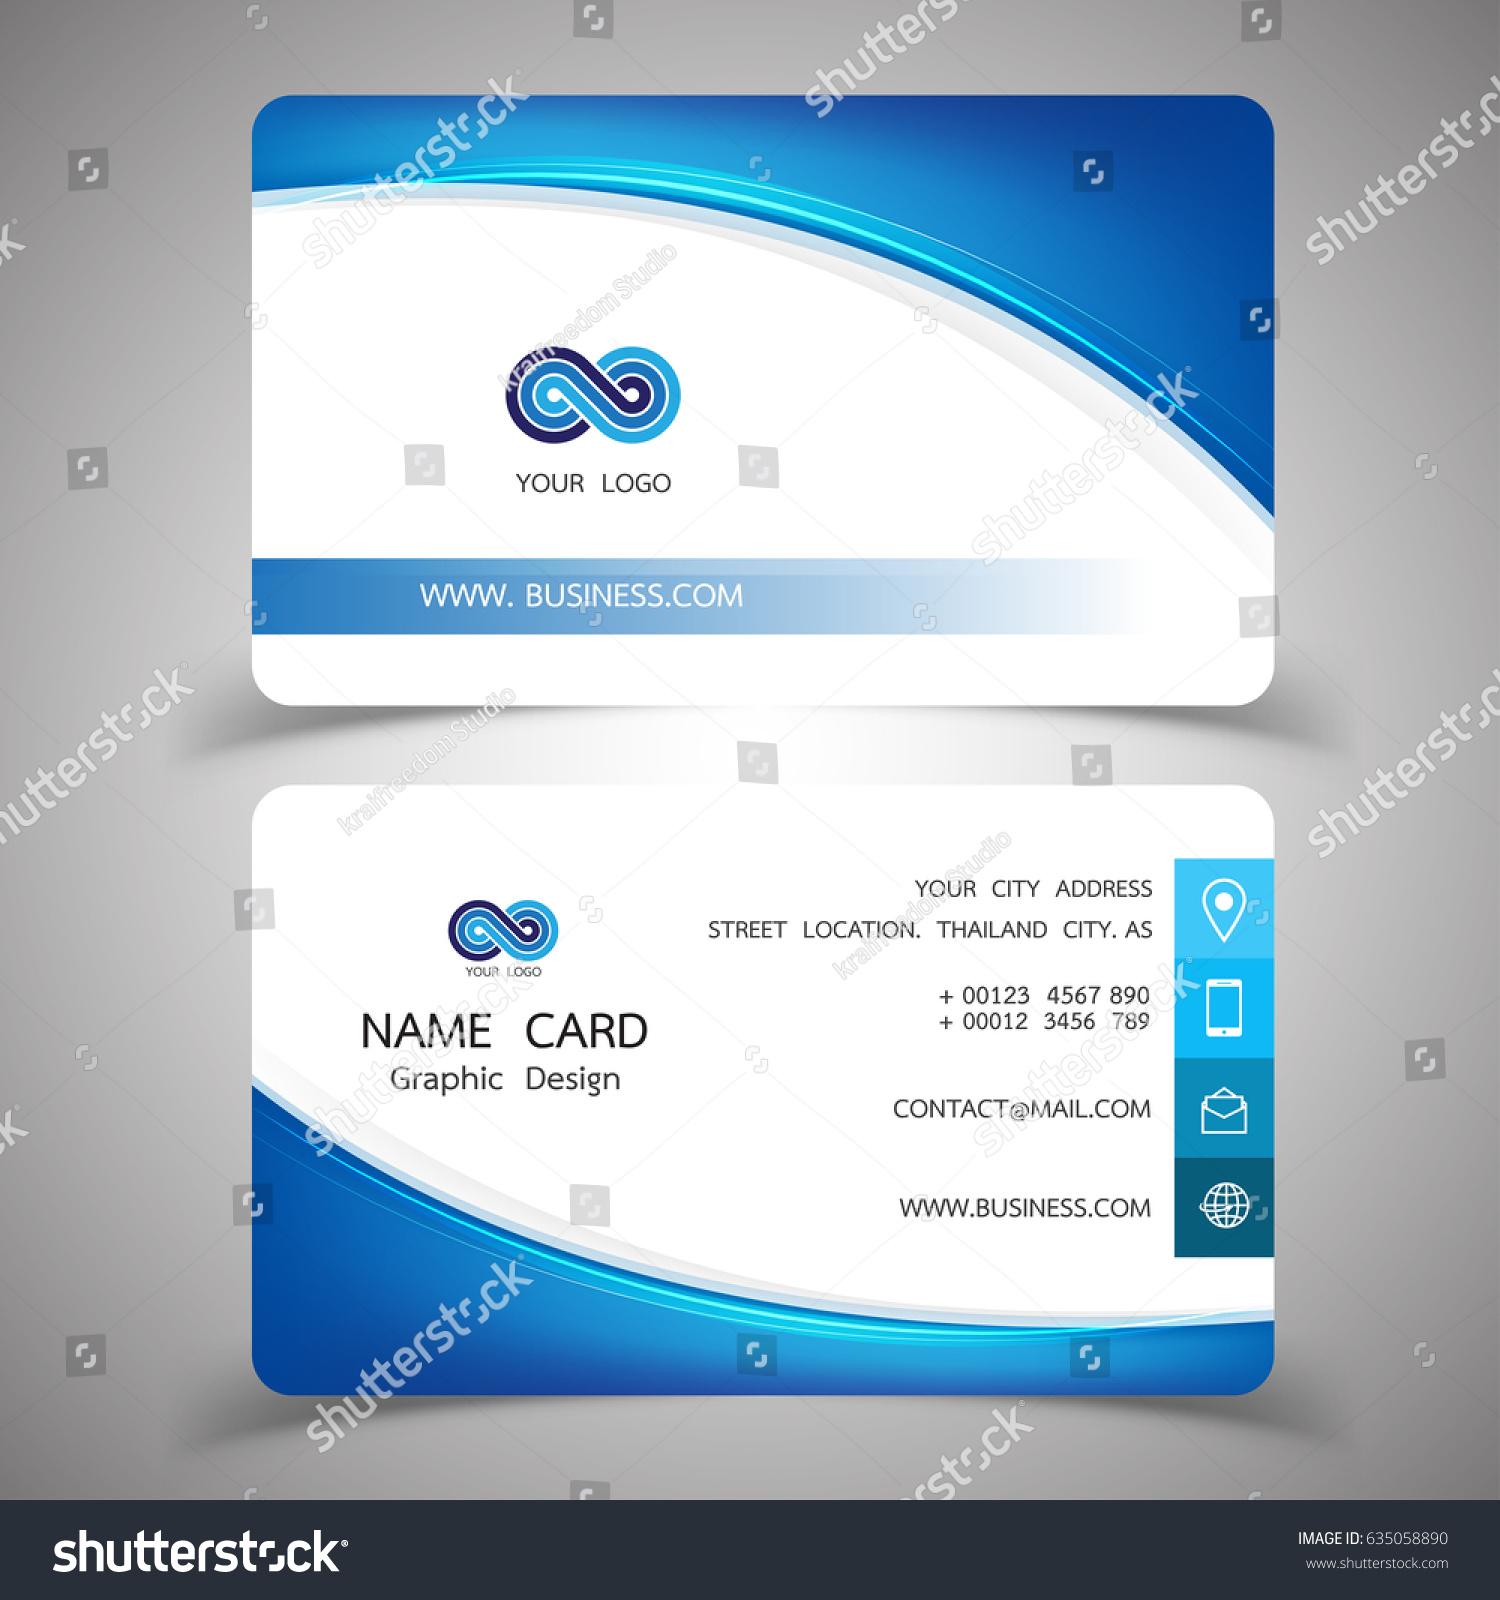 Business Card Design Set Modern Creative Stock Vector 635058890 ...